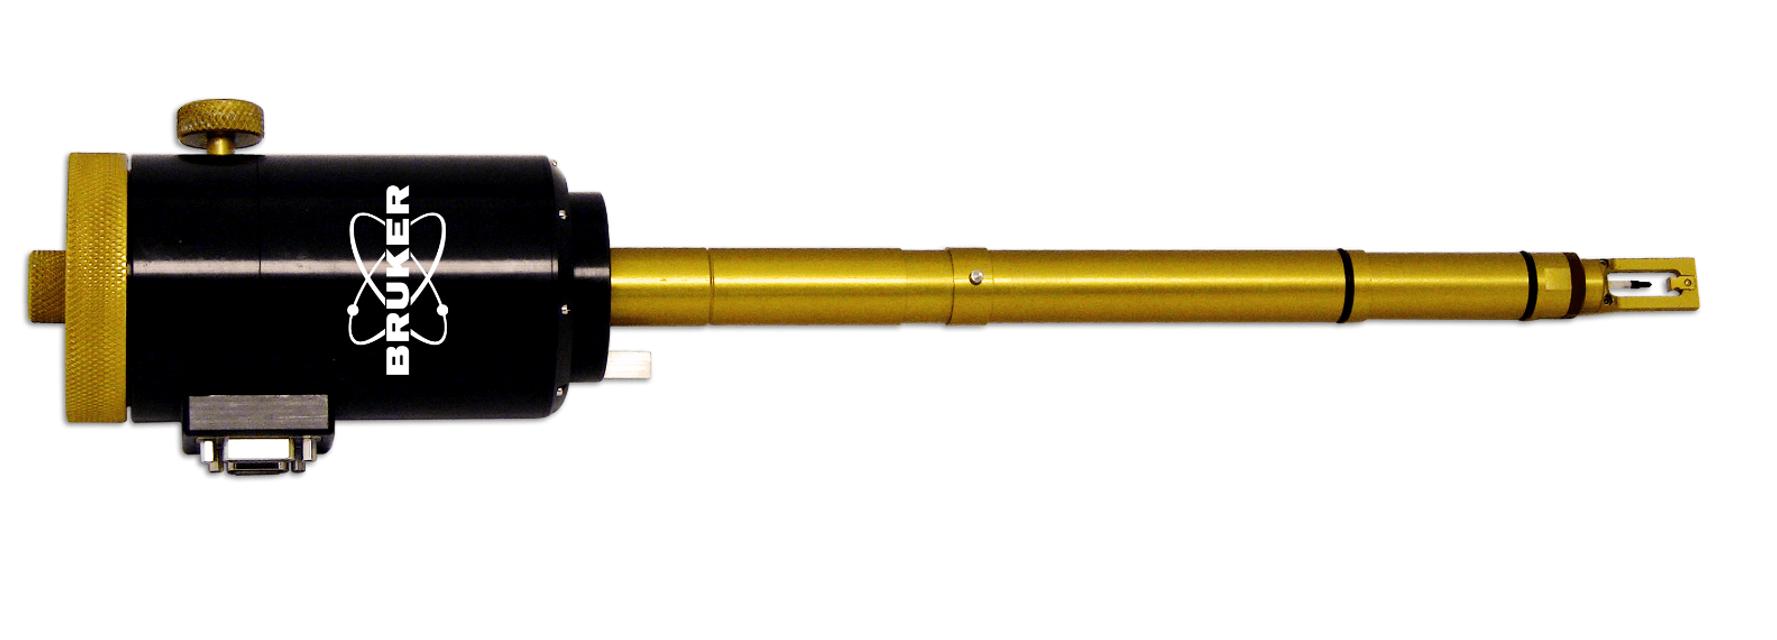 Hysitron PI 95 TEM PicoIndenter – Quantitative, Direct-Observation Nanomechanical Testing Inside Your TEM